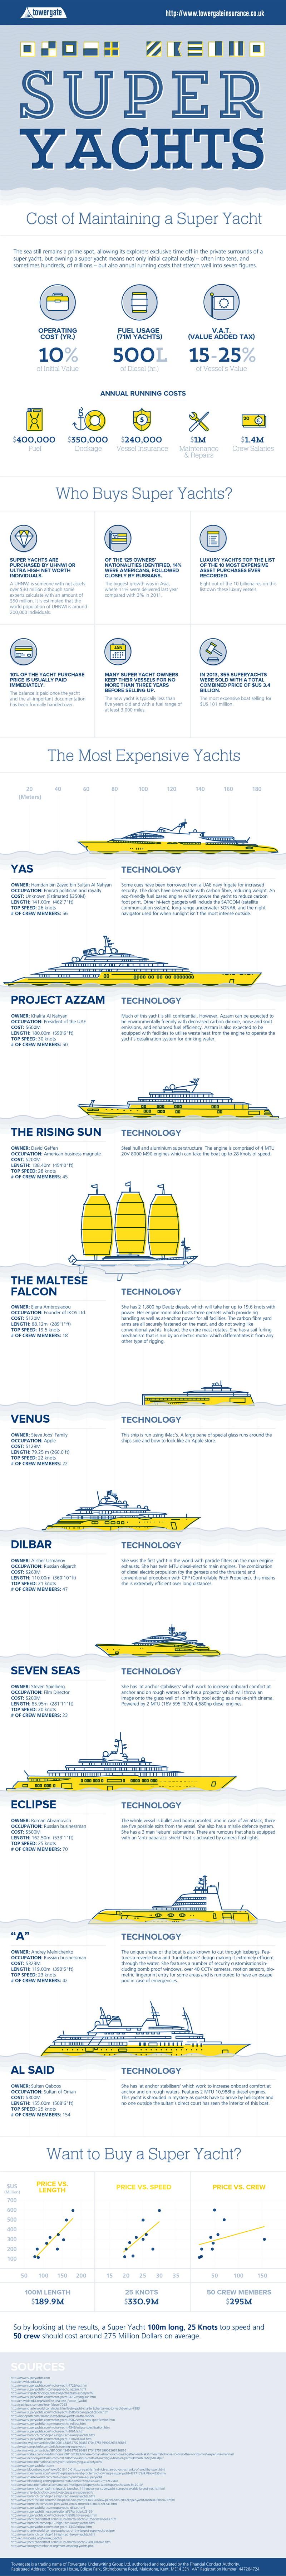 Superyacht-infographic-2